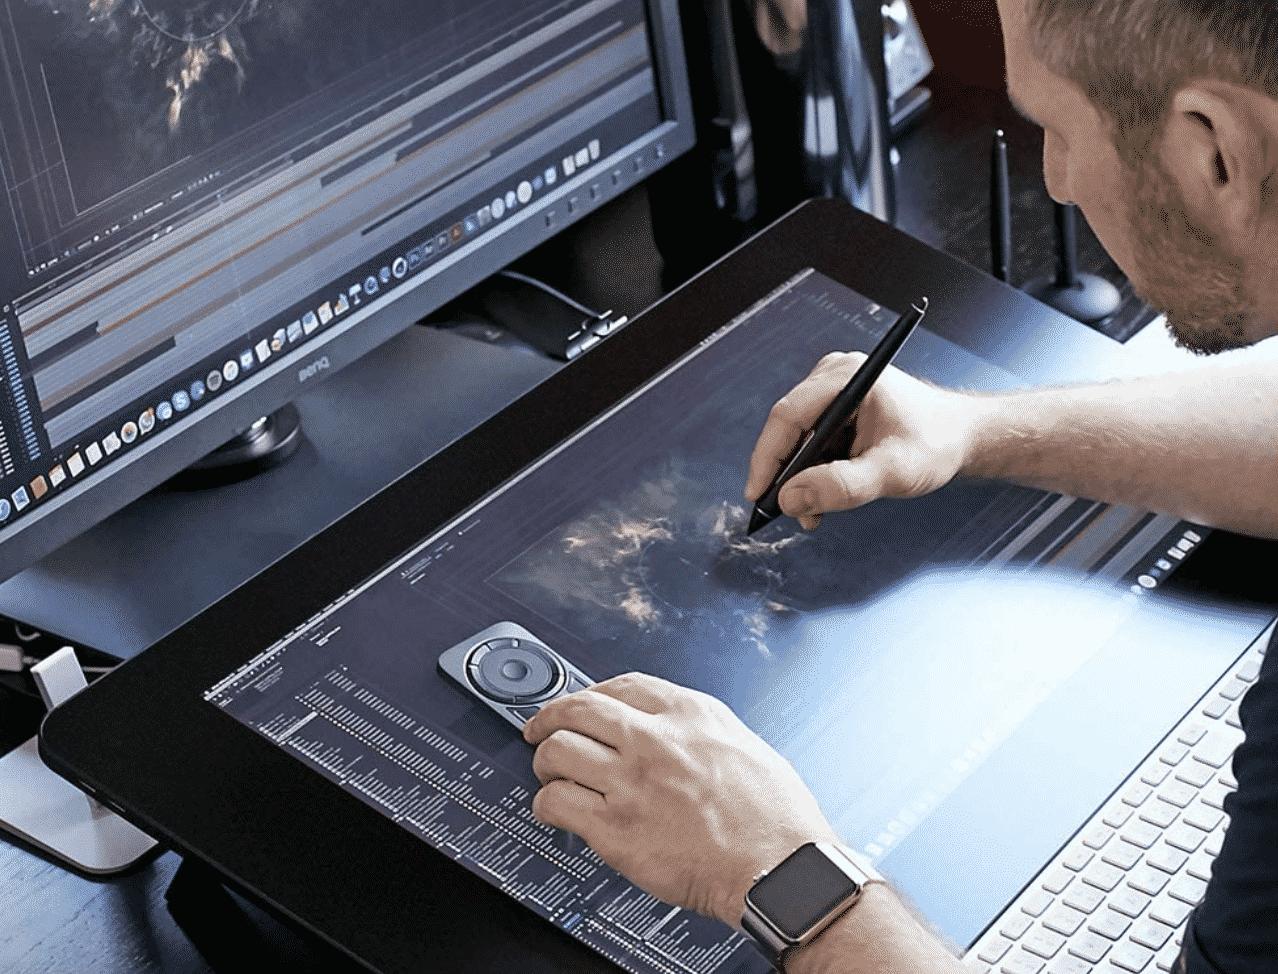 Wacom DTK2420K0 Cintiq Pro 24 Creative Pen Display – 4K Graphic Drawing Monitor